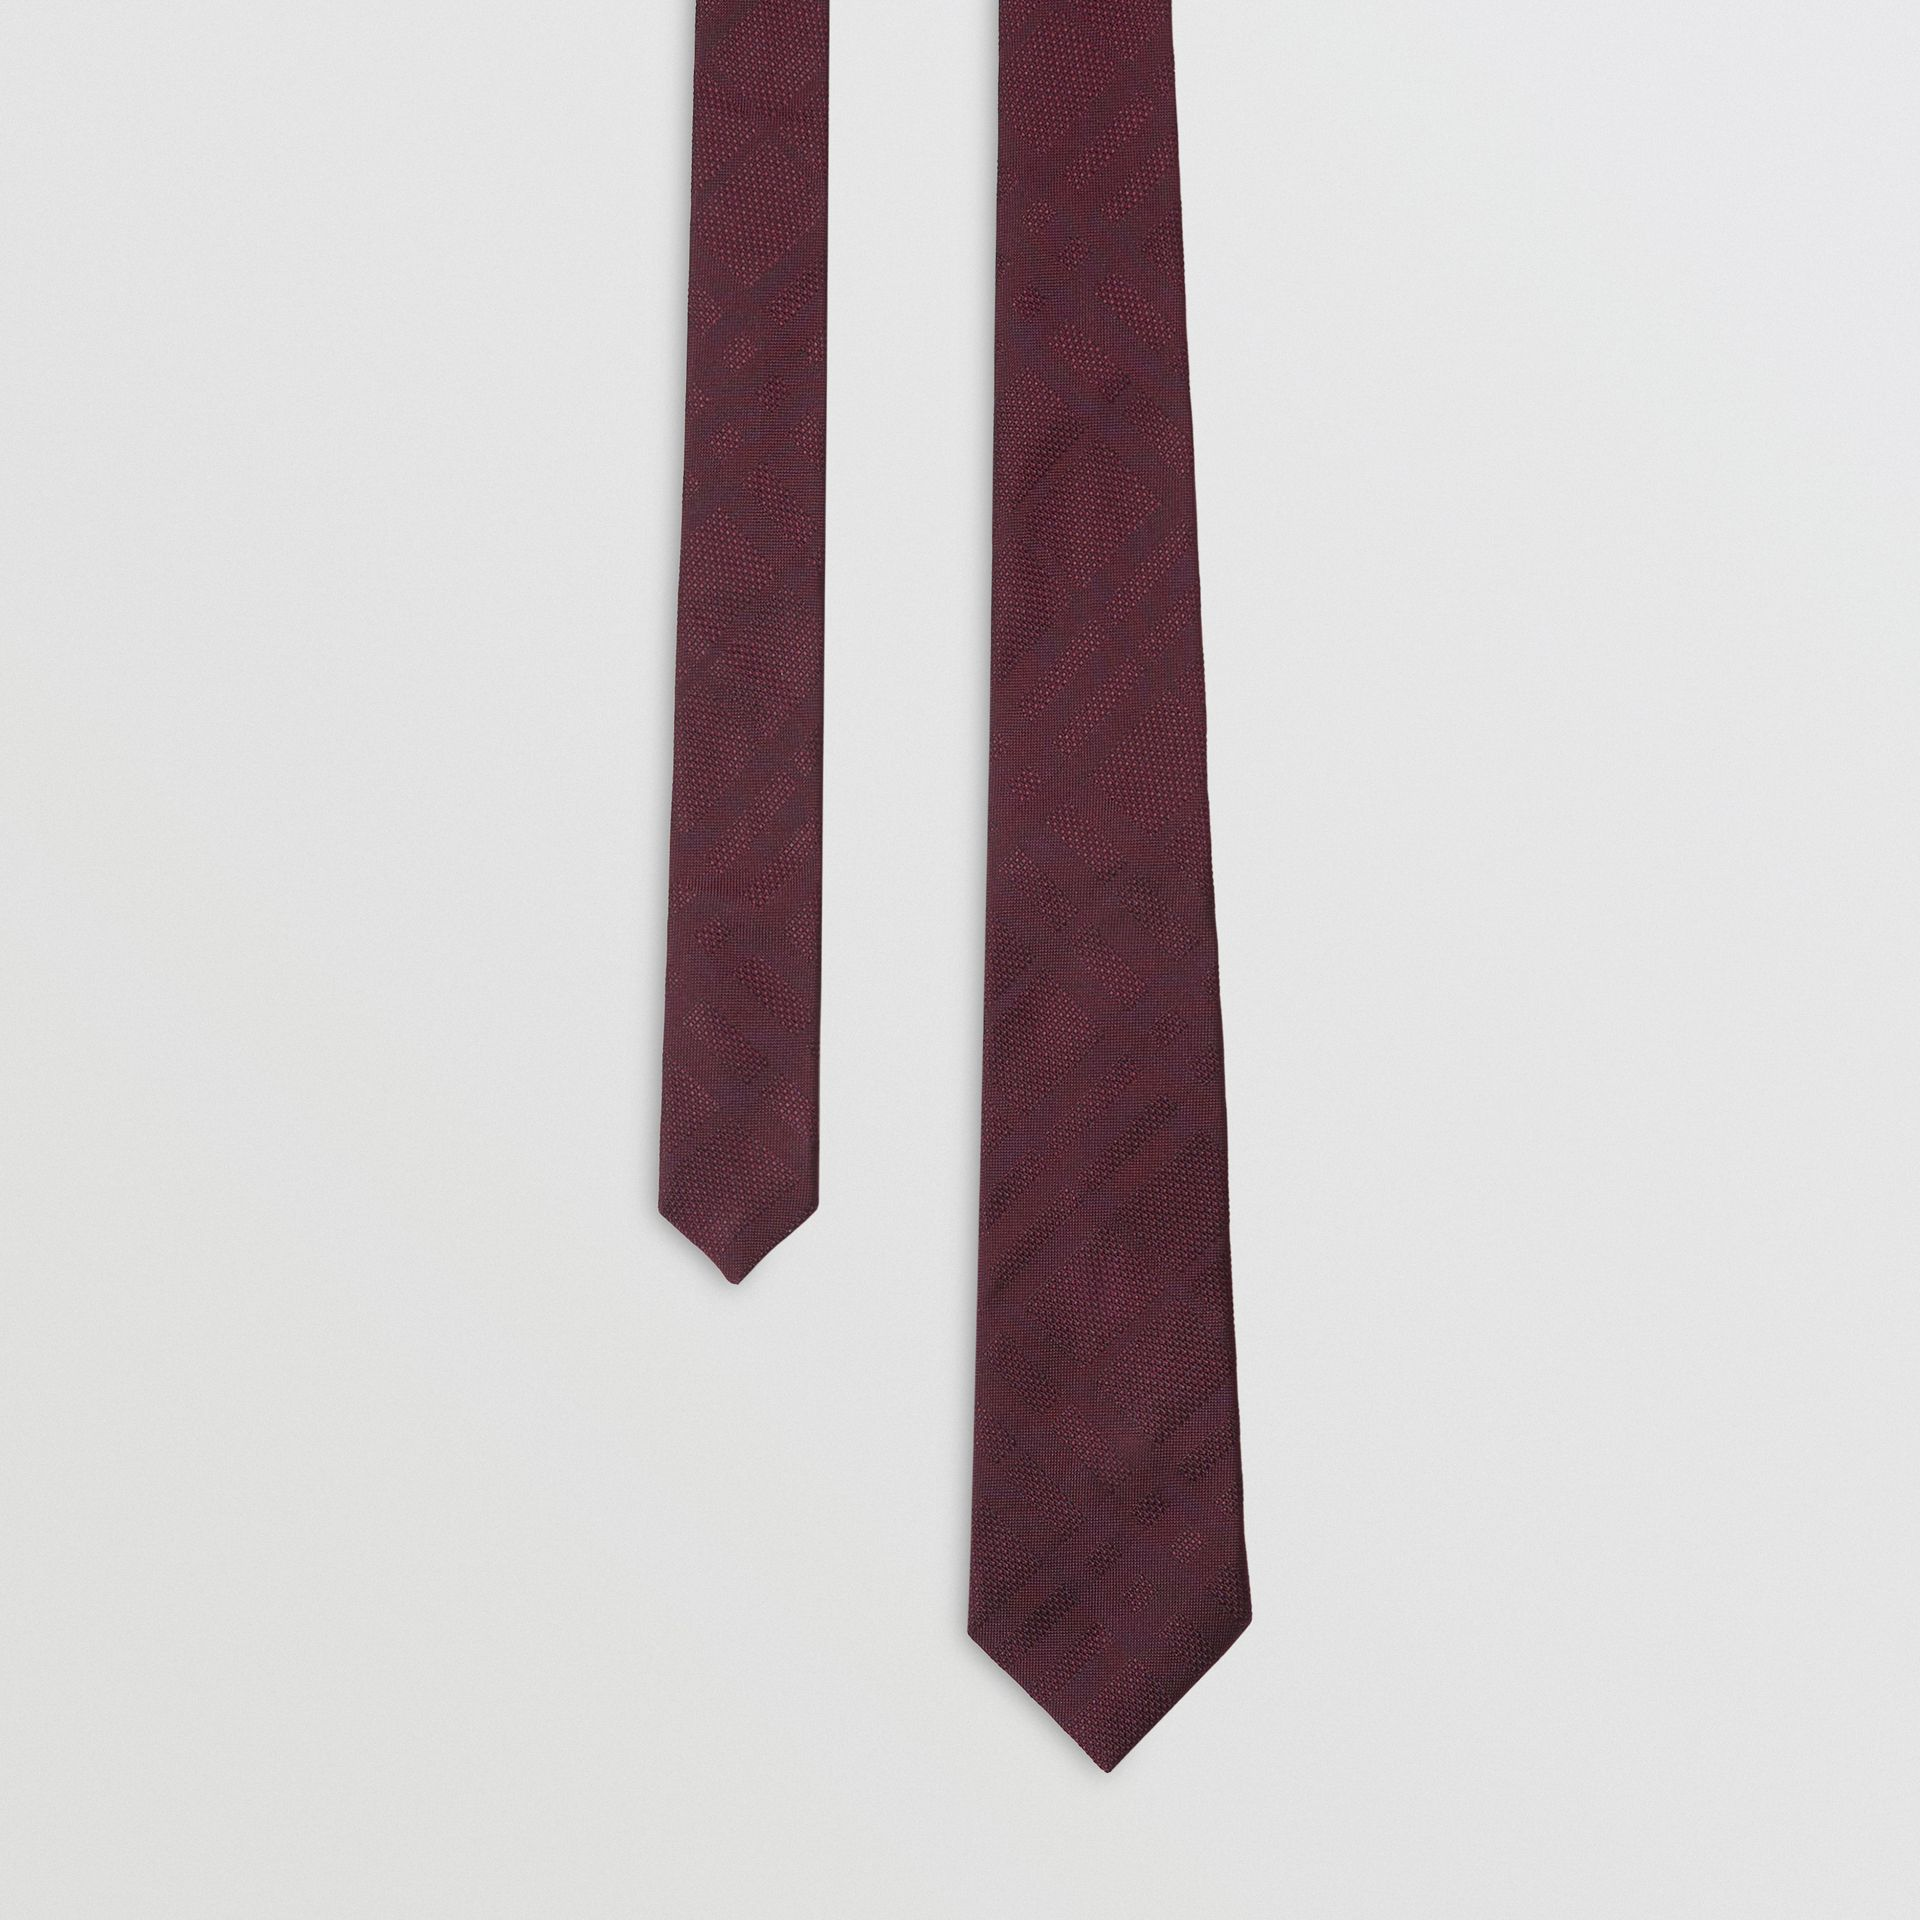 Modern Cut Check Silk Tie in Deep Claret - Men | Burberry - gallery image 0